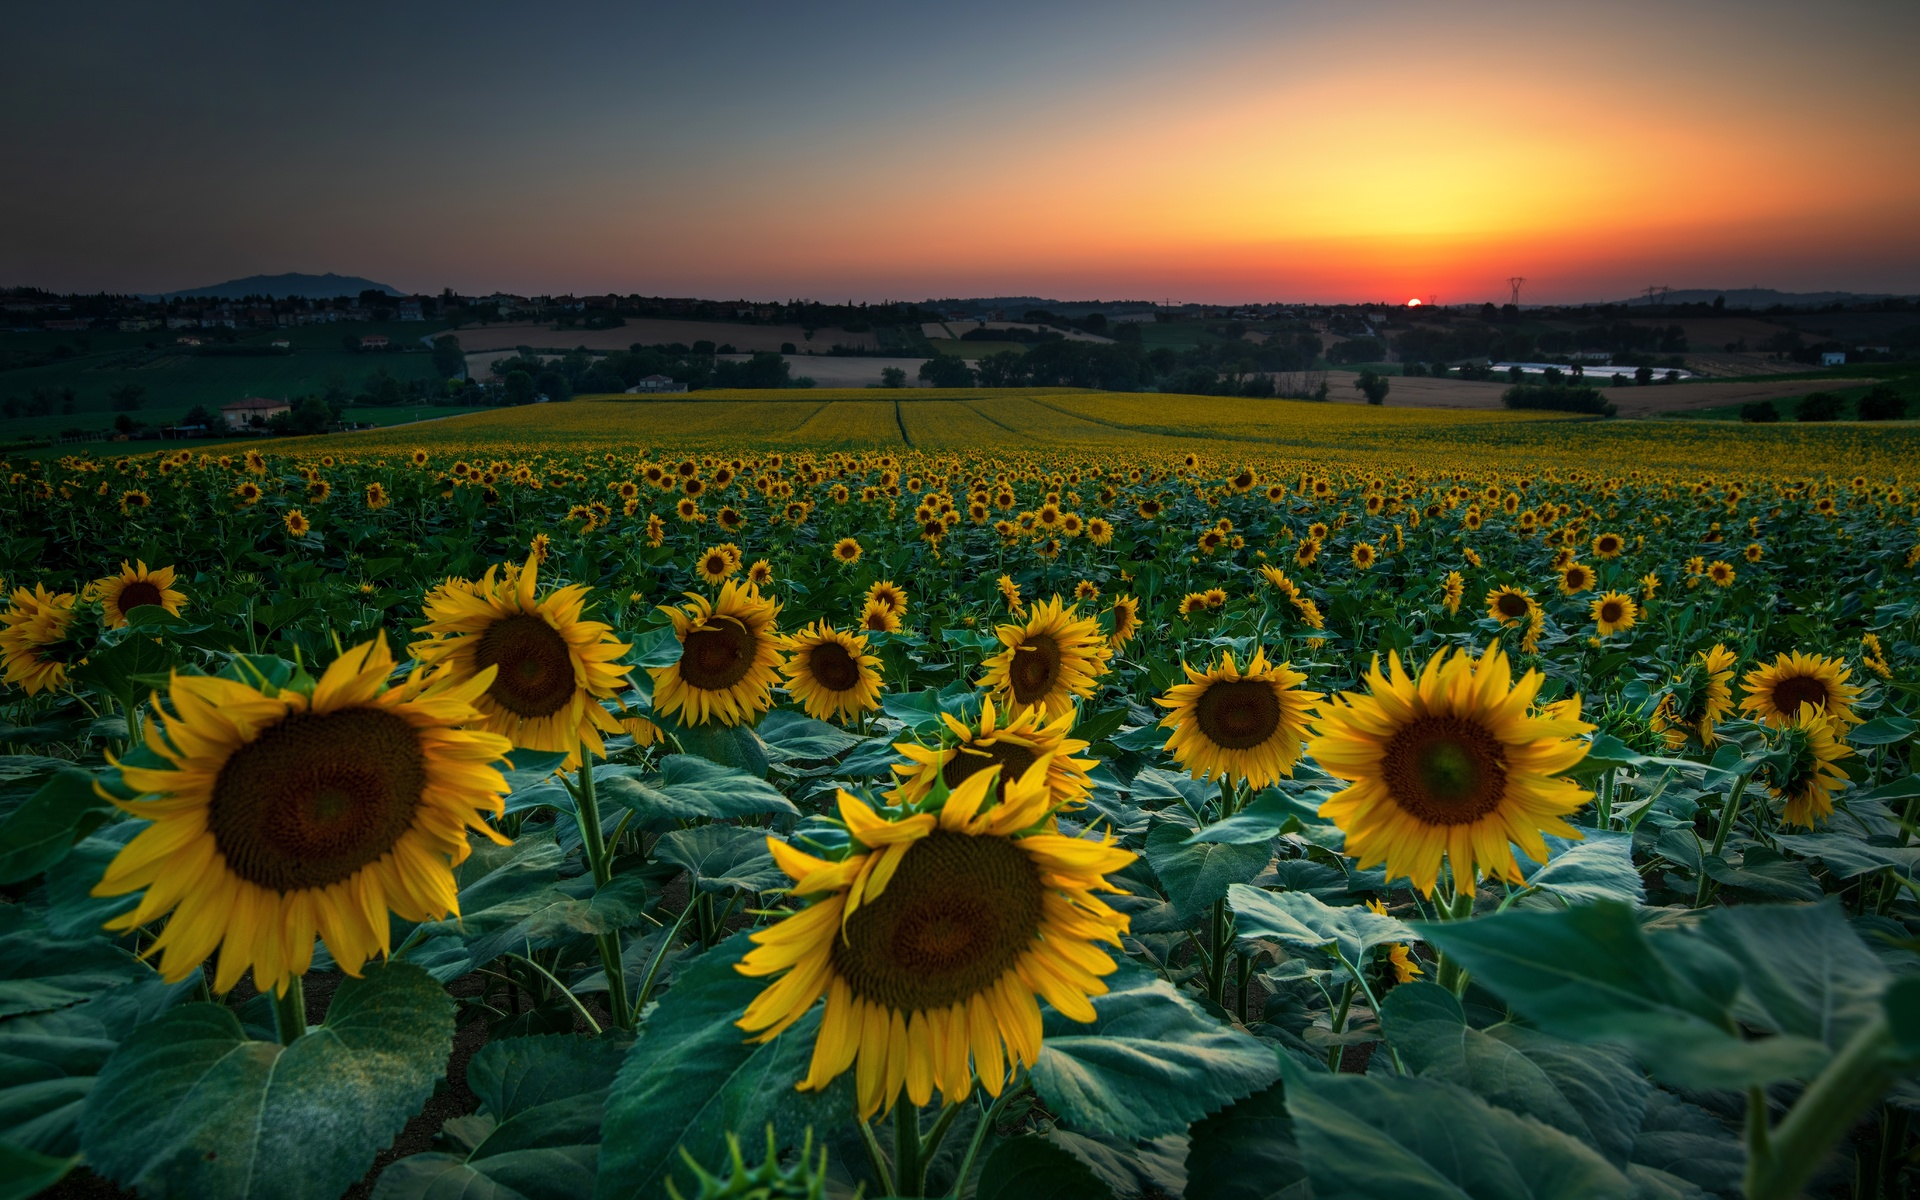 поле, подсолнухи, природа